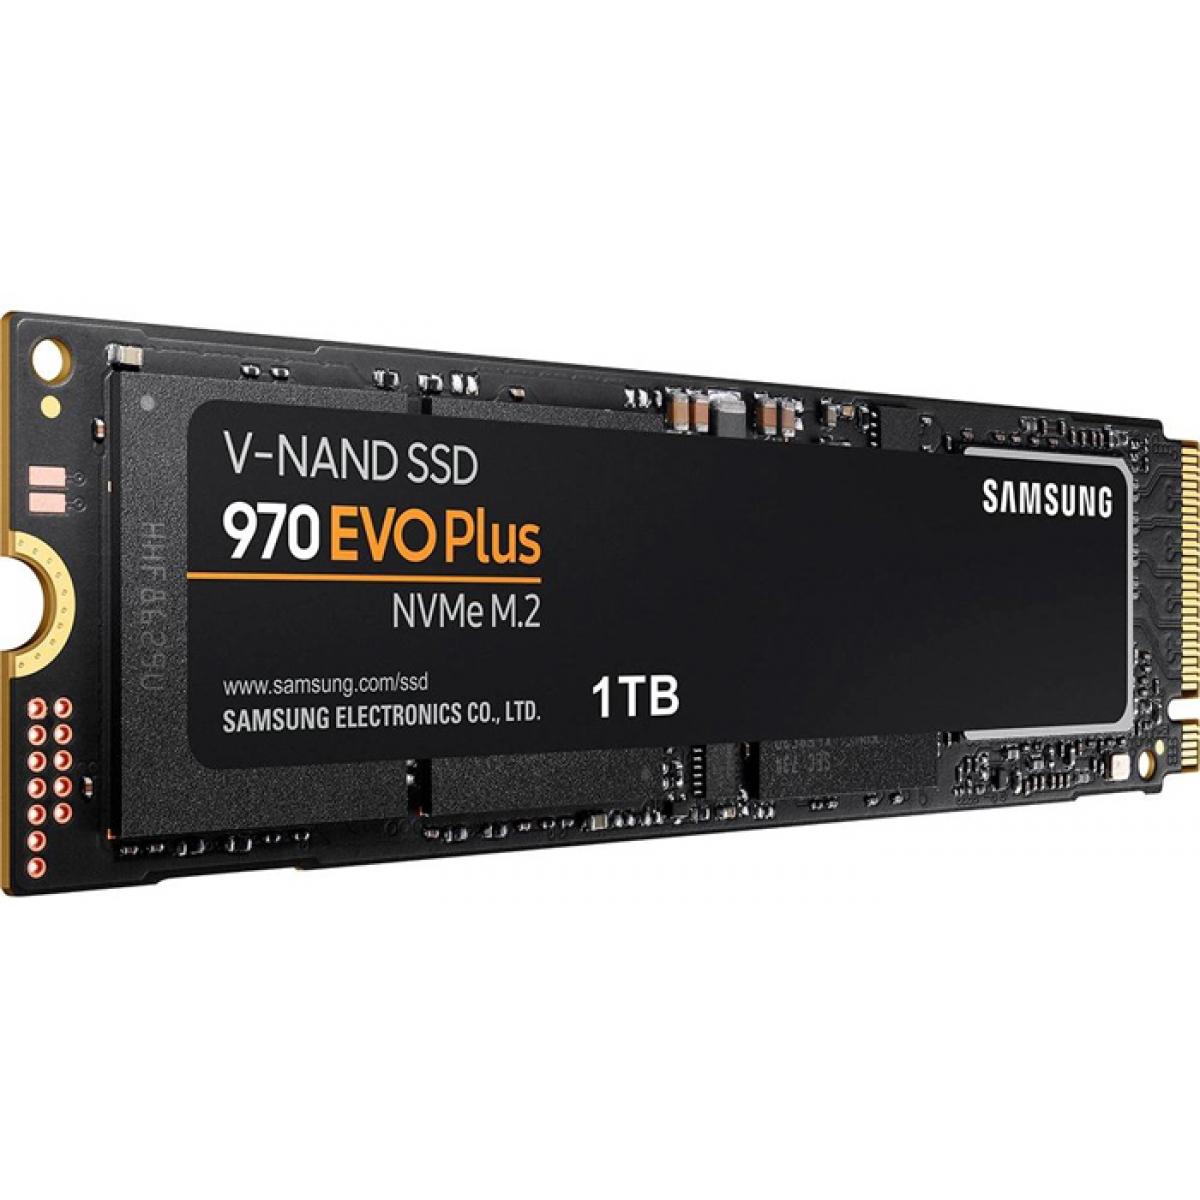 SSD Samsung 970 EVO Plus, 1TB, M.2 2280, NVMe, Leitura 3500MBs e Gravação 3300MBs, MZ-V7S1T0B/AM